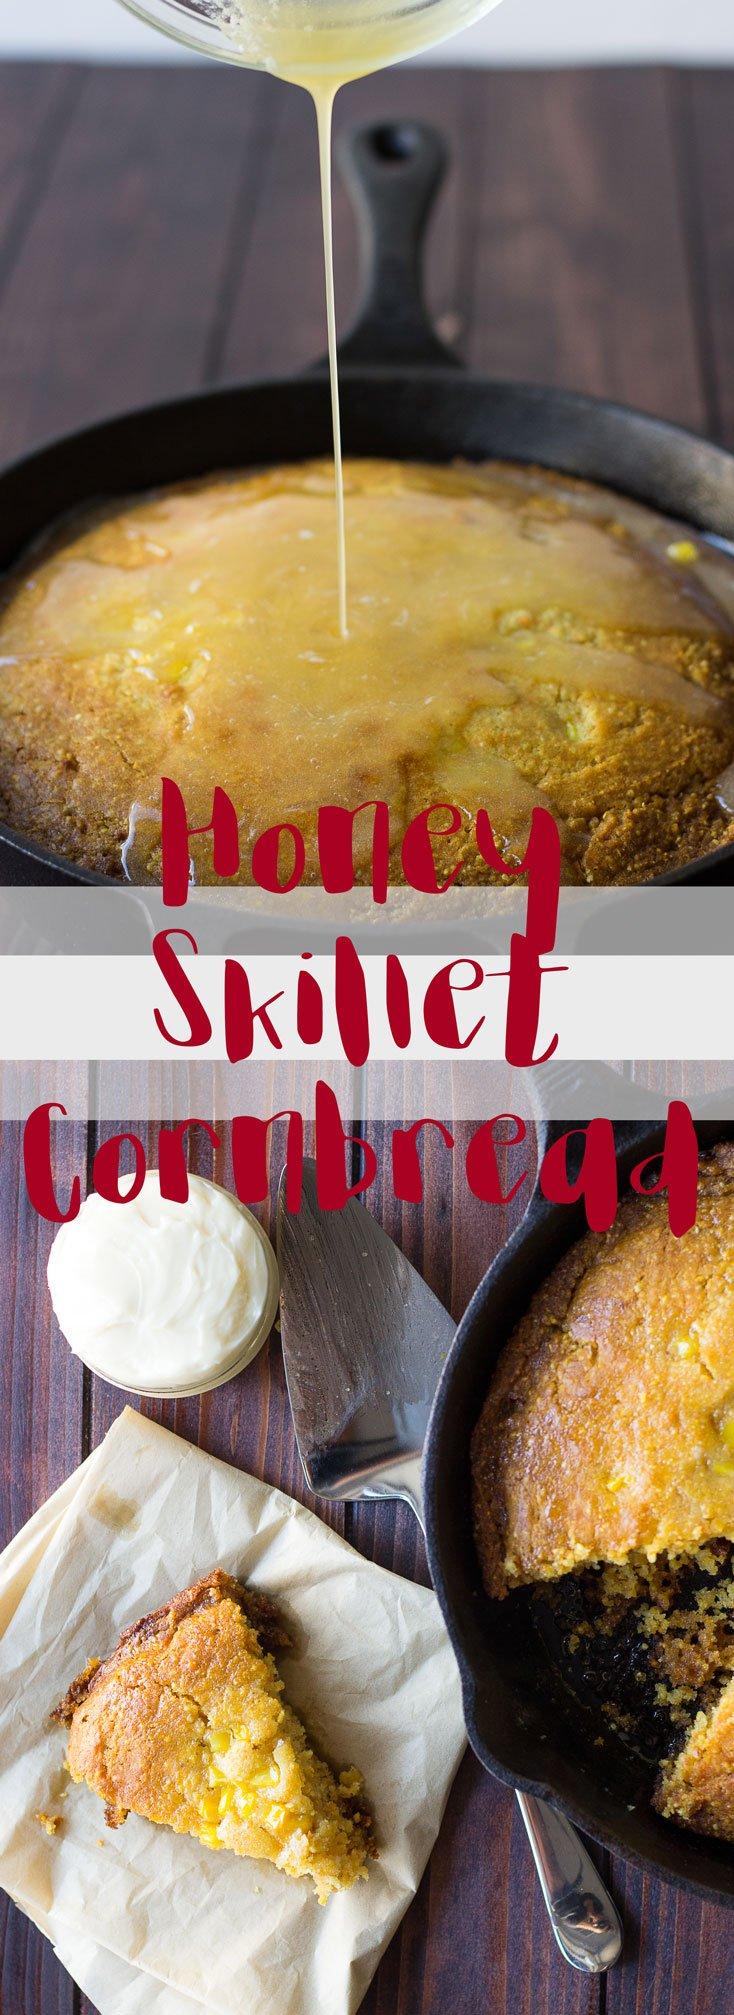 Honey Skillet Cornbread // Fork in the Kitchen